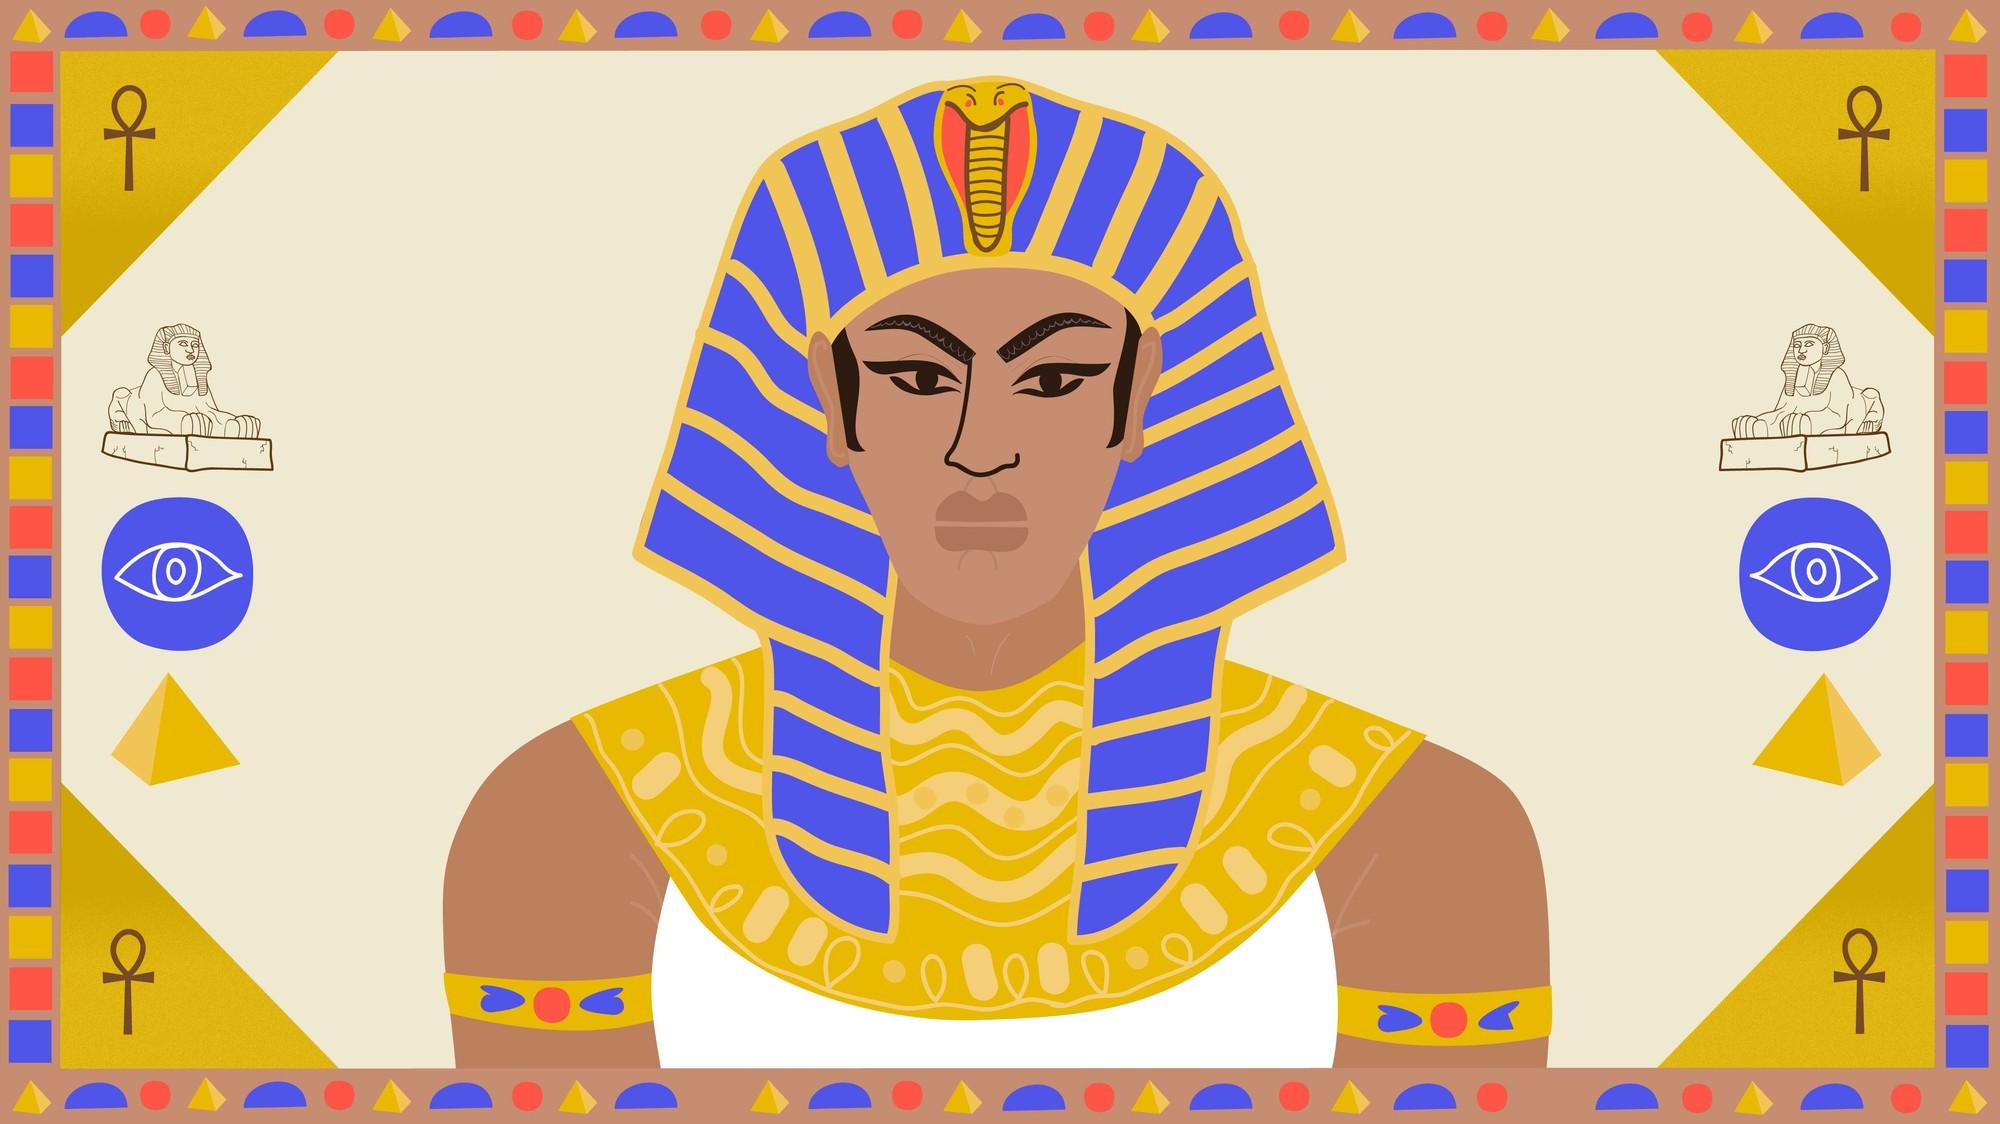 All Hail Hatshepsut, the Cross-Dressing Queen Turned